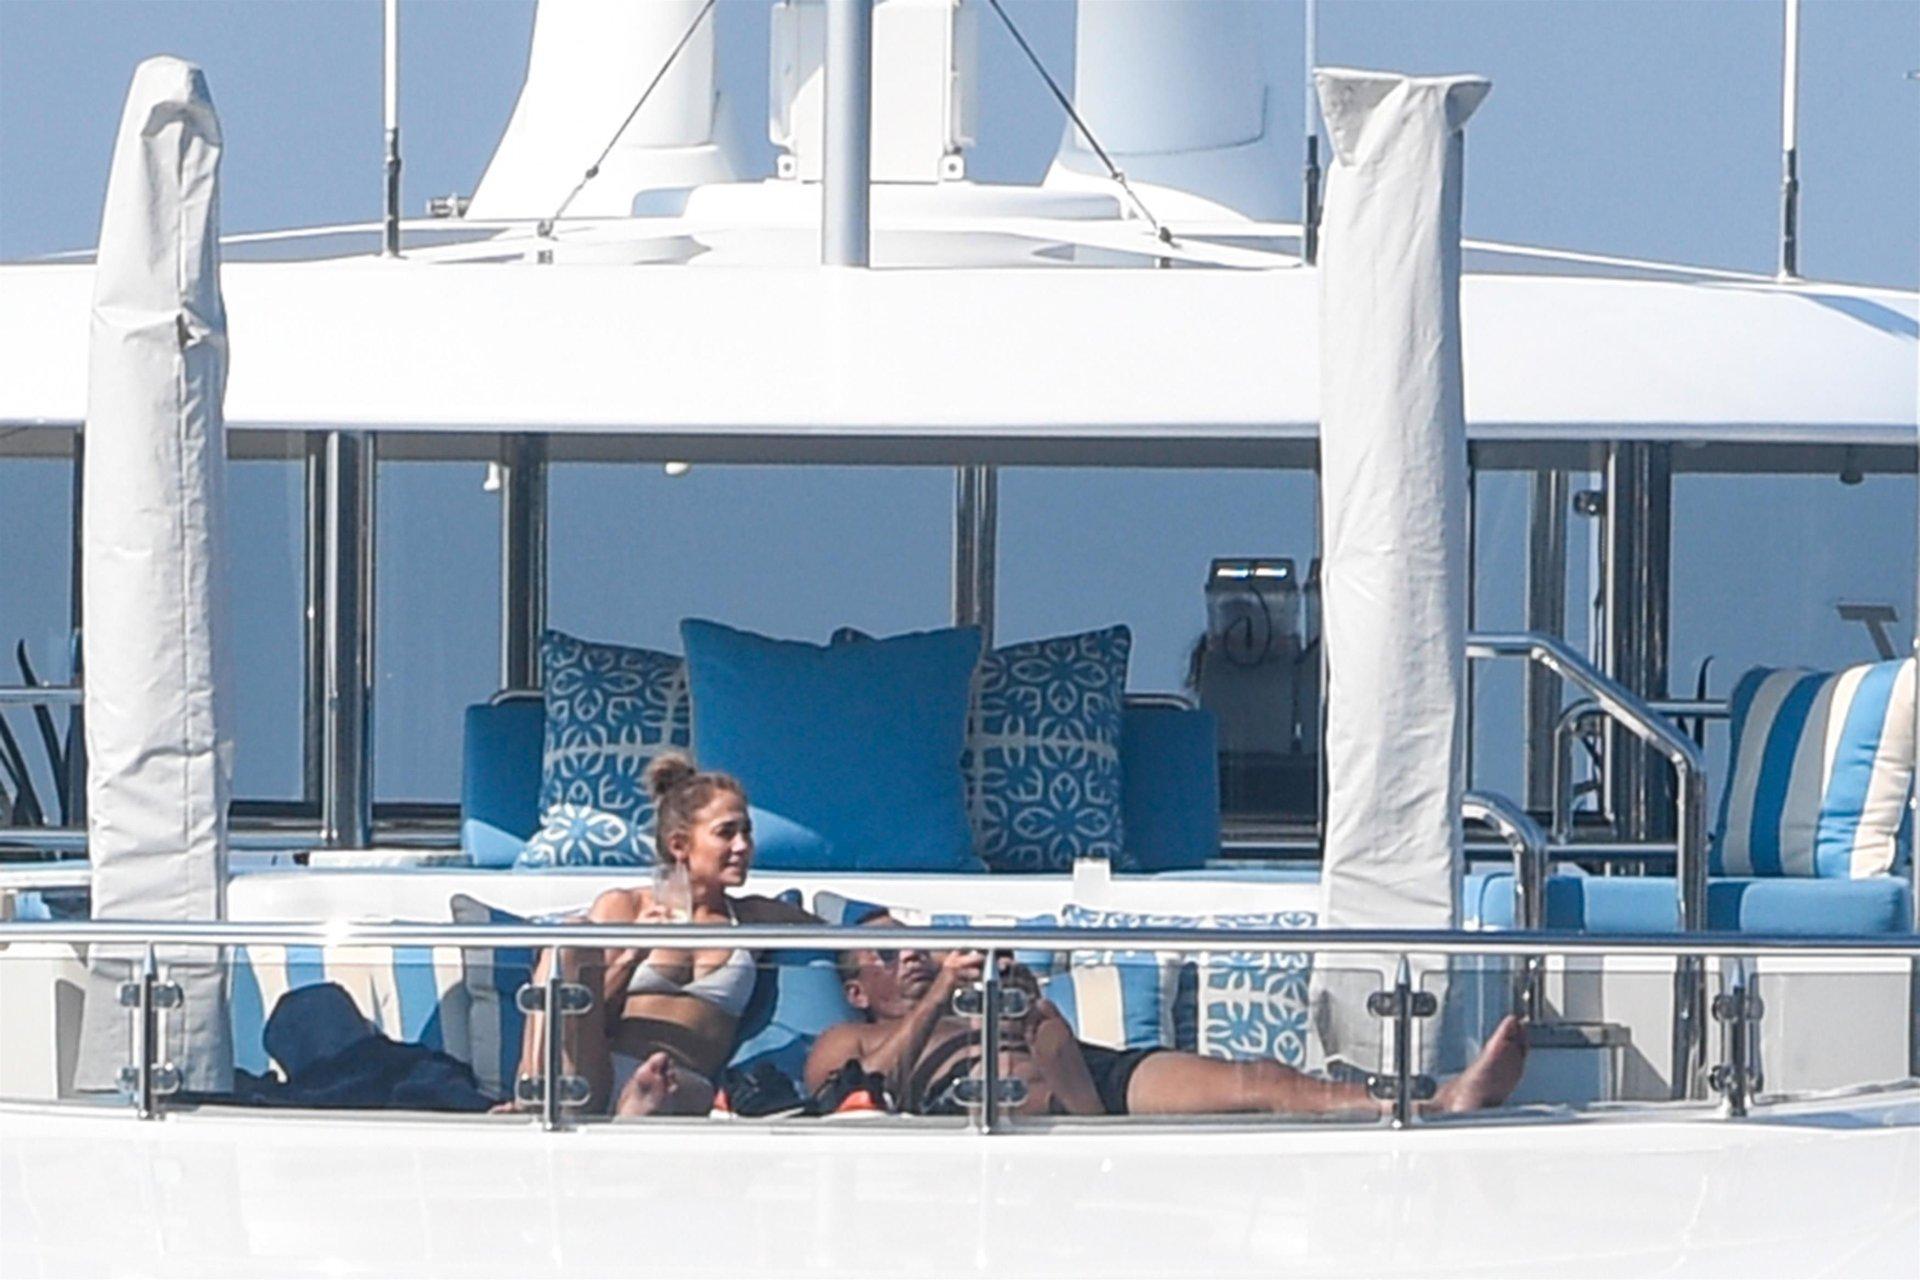 Jennifer-Lopez-Sexy-TheFappeningBlog.com-40.jpg